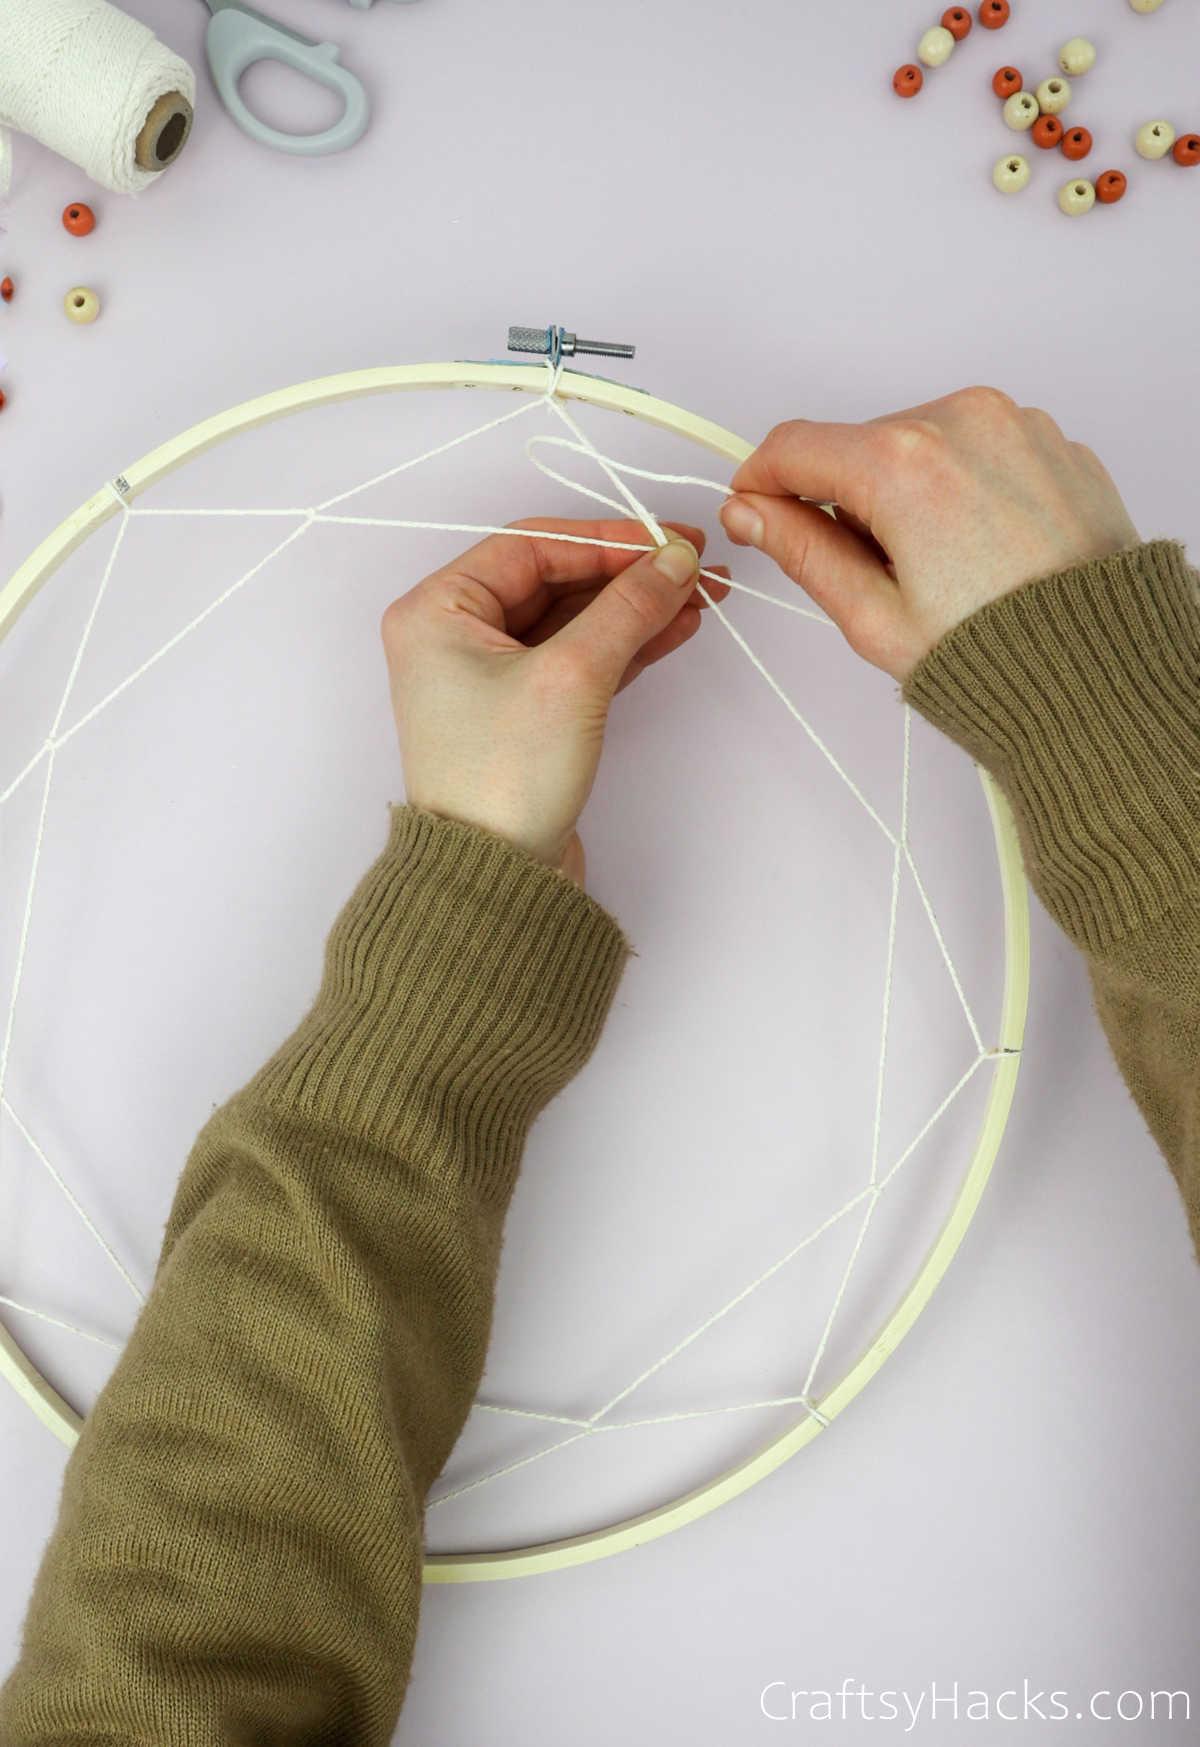 attaching string